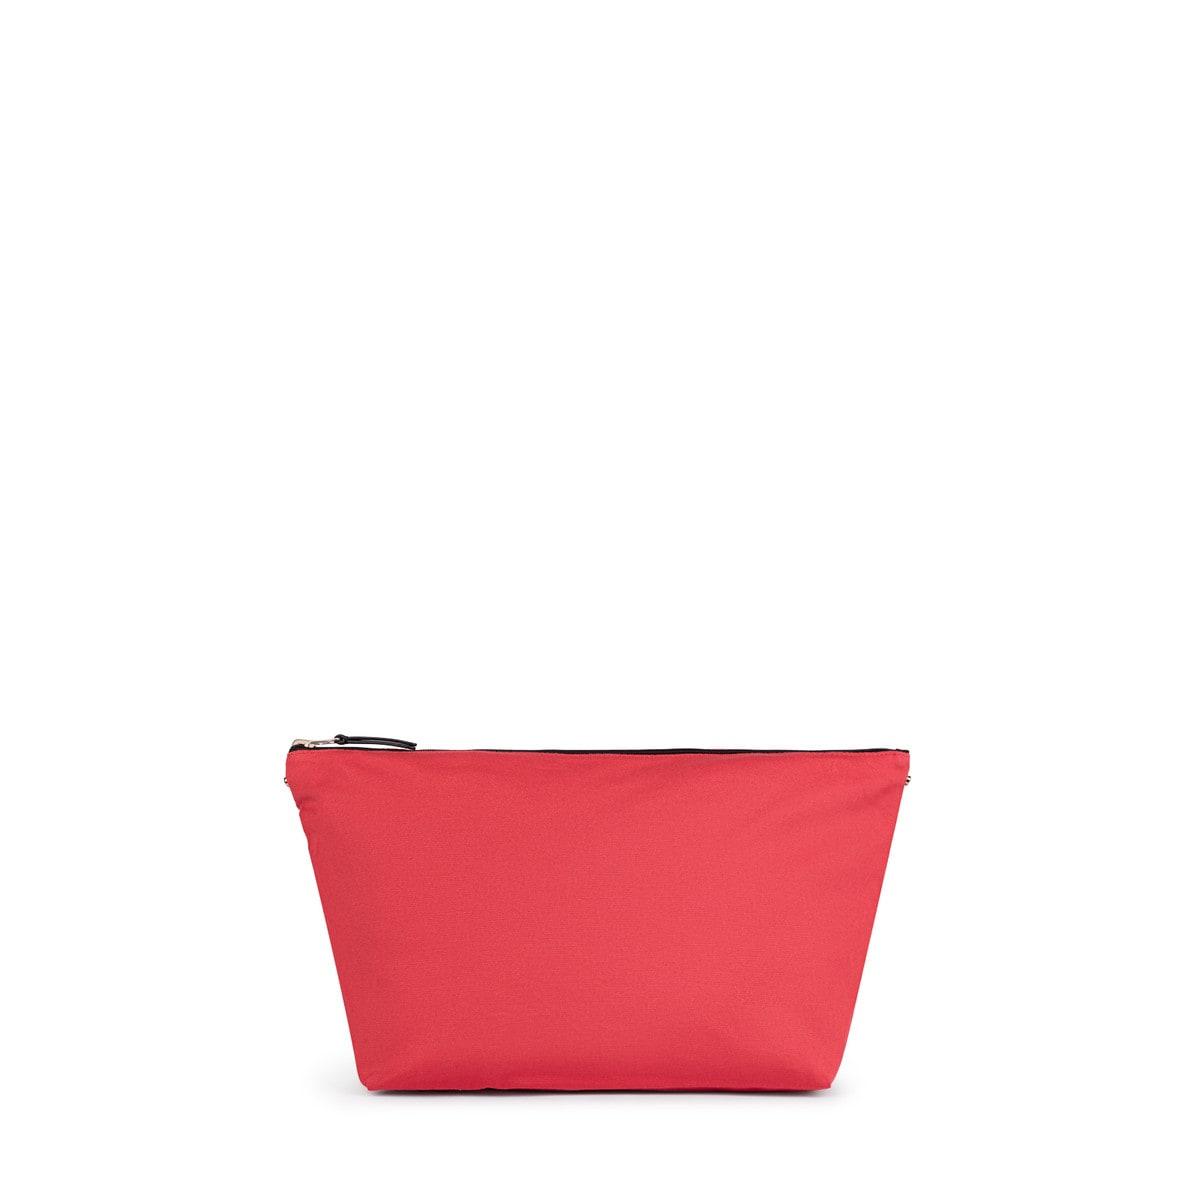 4ba7c09d5c Μικρή τσάντα Kaos Shock σε κόκκινο-μπεζ χρώμα - Tous Site Grecia